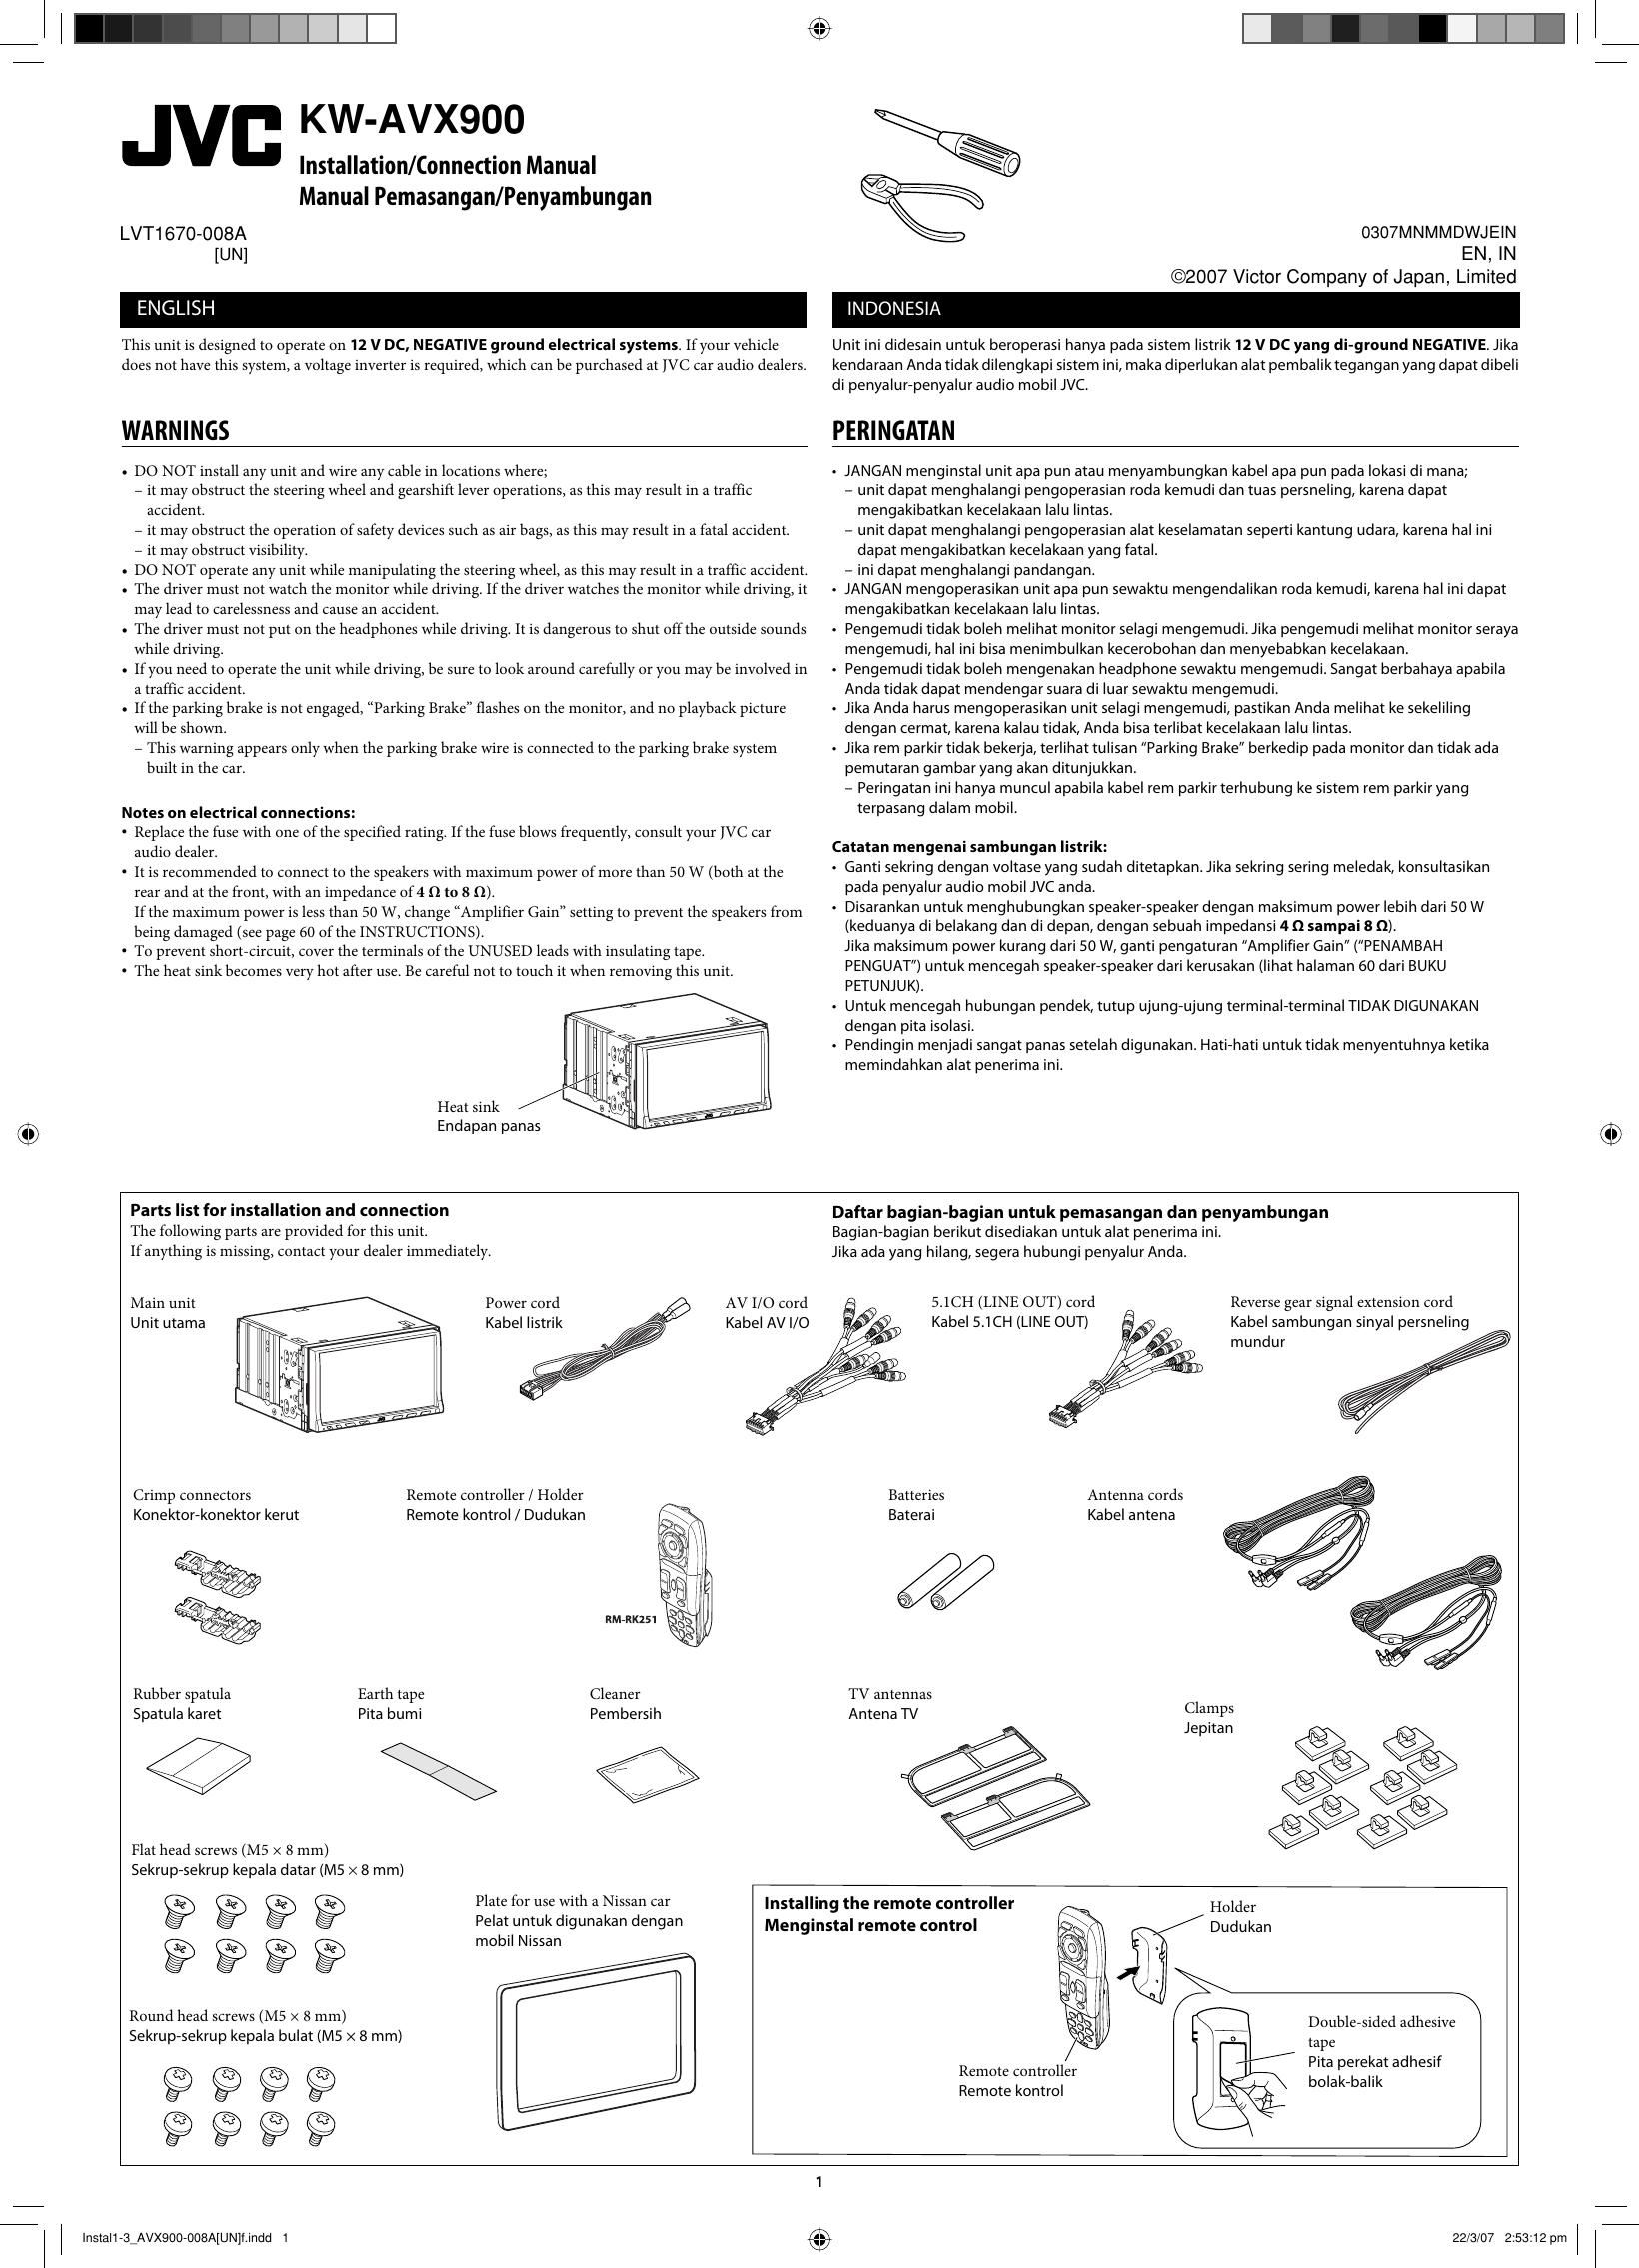 Jvc Kw Avx900un Installation User Manual Lvt1670 008a Avx 900 Wiring Diagram